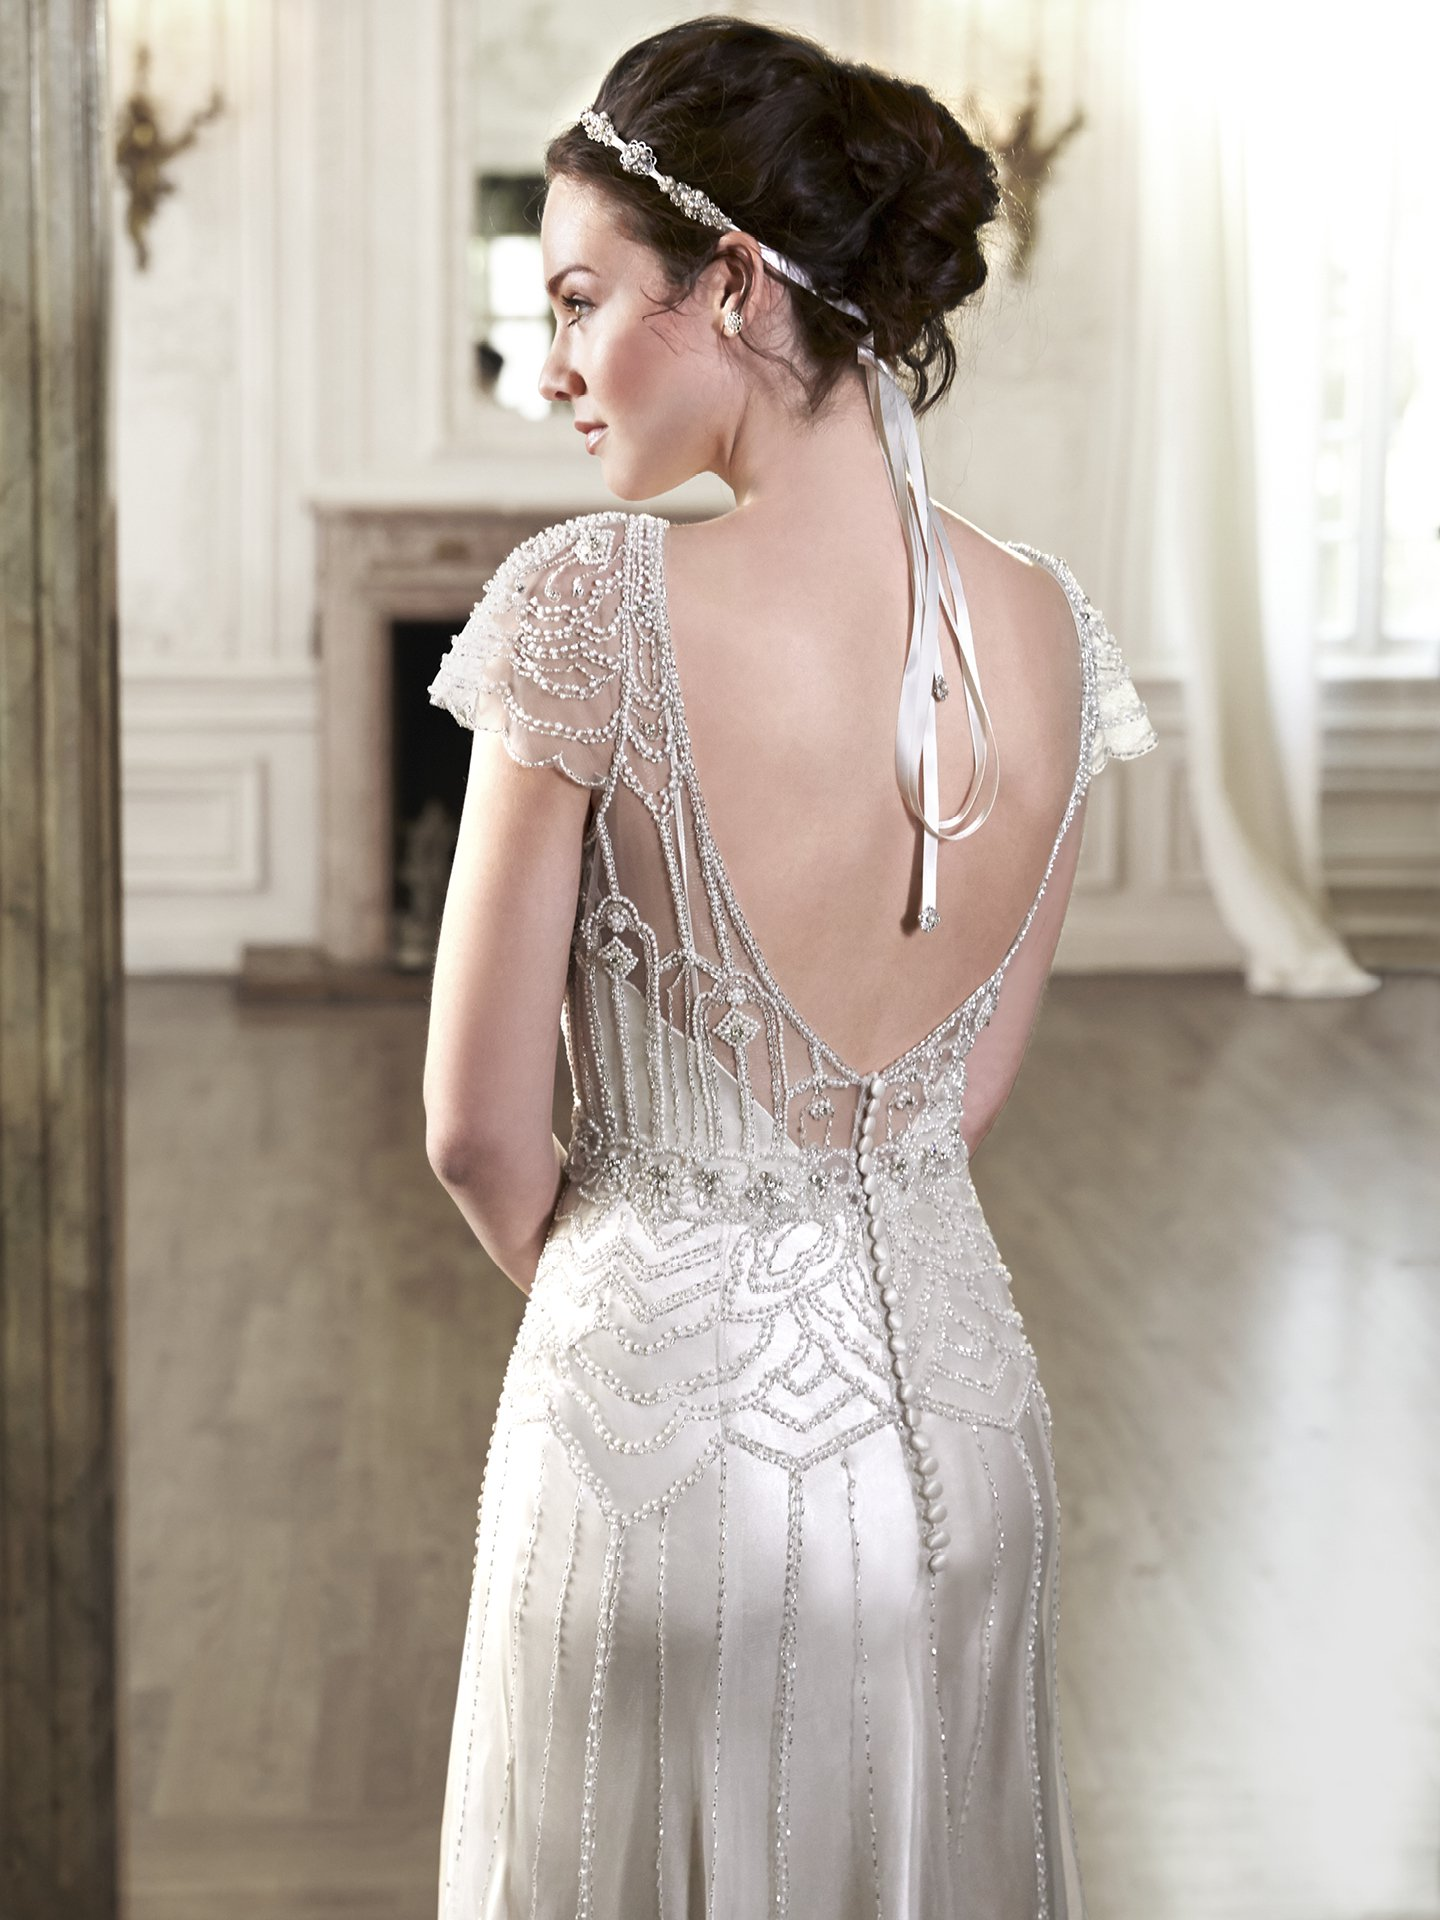 Maggie-Sottero-Wedding-Dress-Ettia-5MN084-alt1.jpg